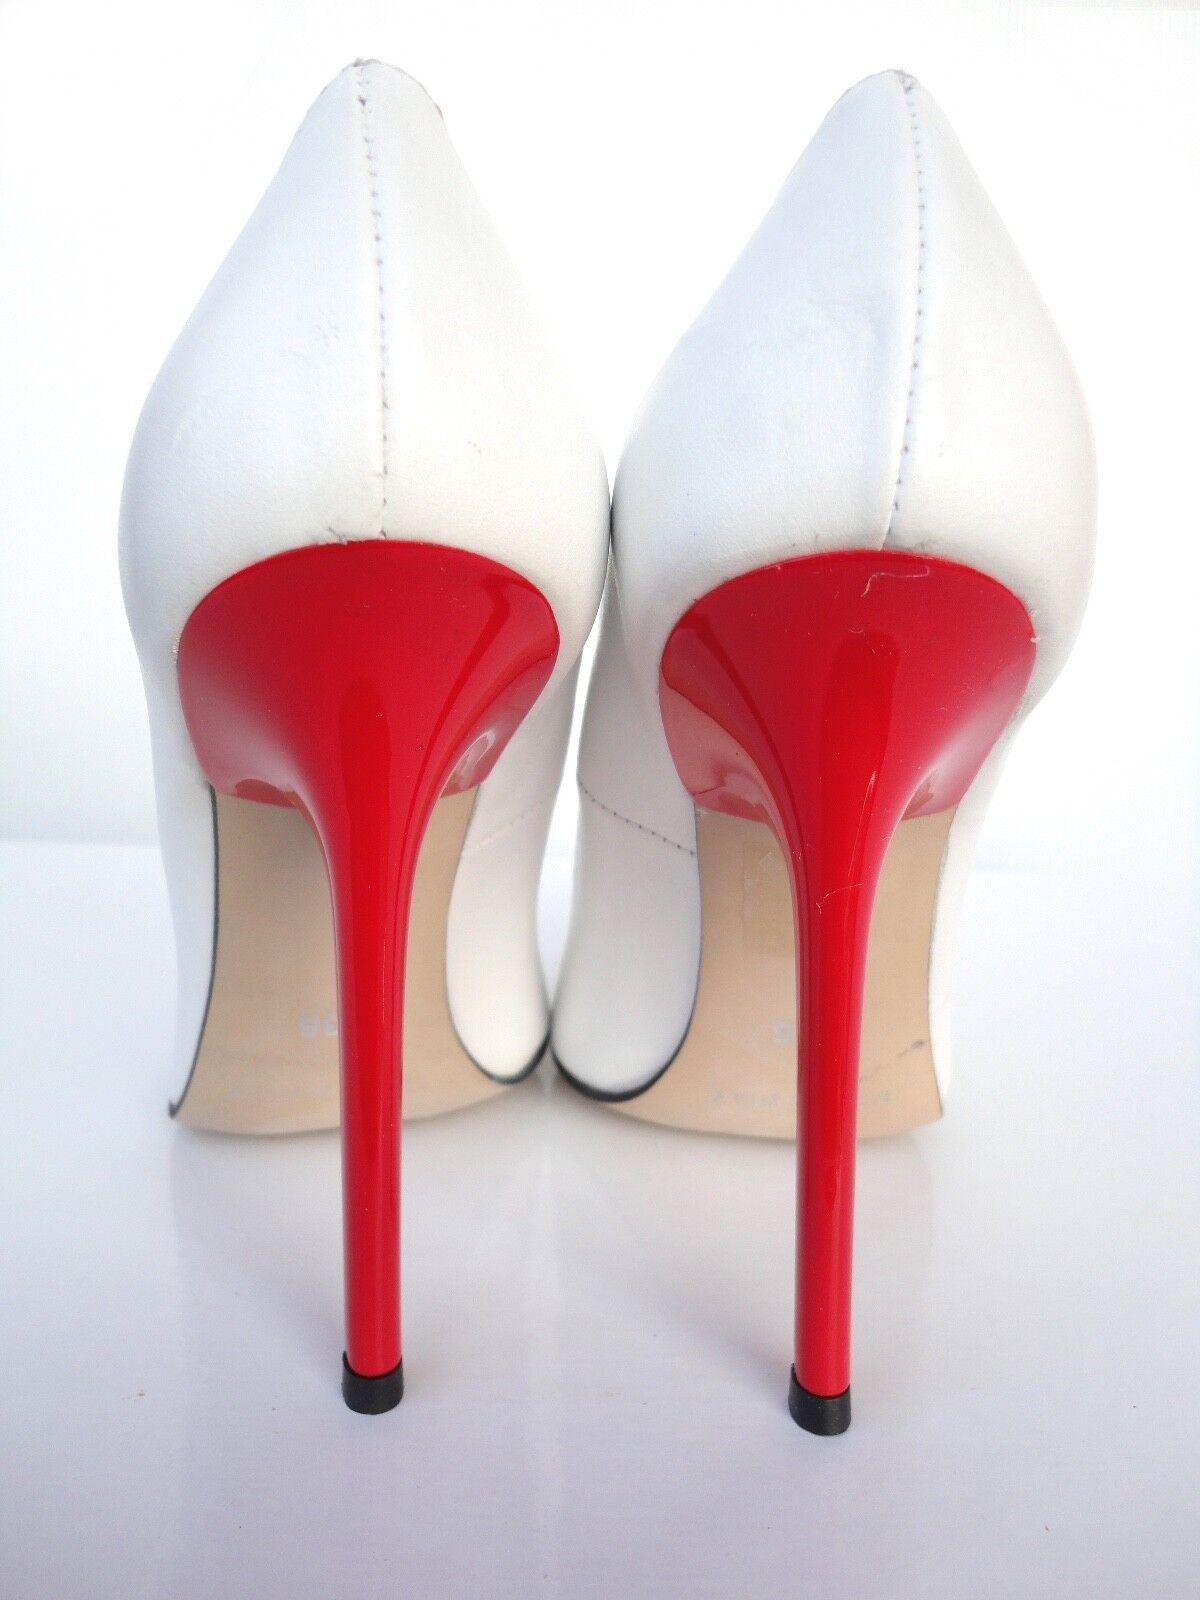 GIOHEL ITALIA ROSSO HEELS POINTY TOE PUMPS scarpeS LETTORE CORTE BIANCO 36